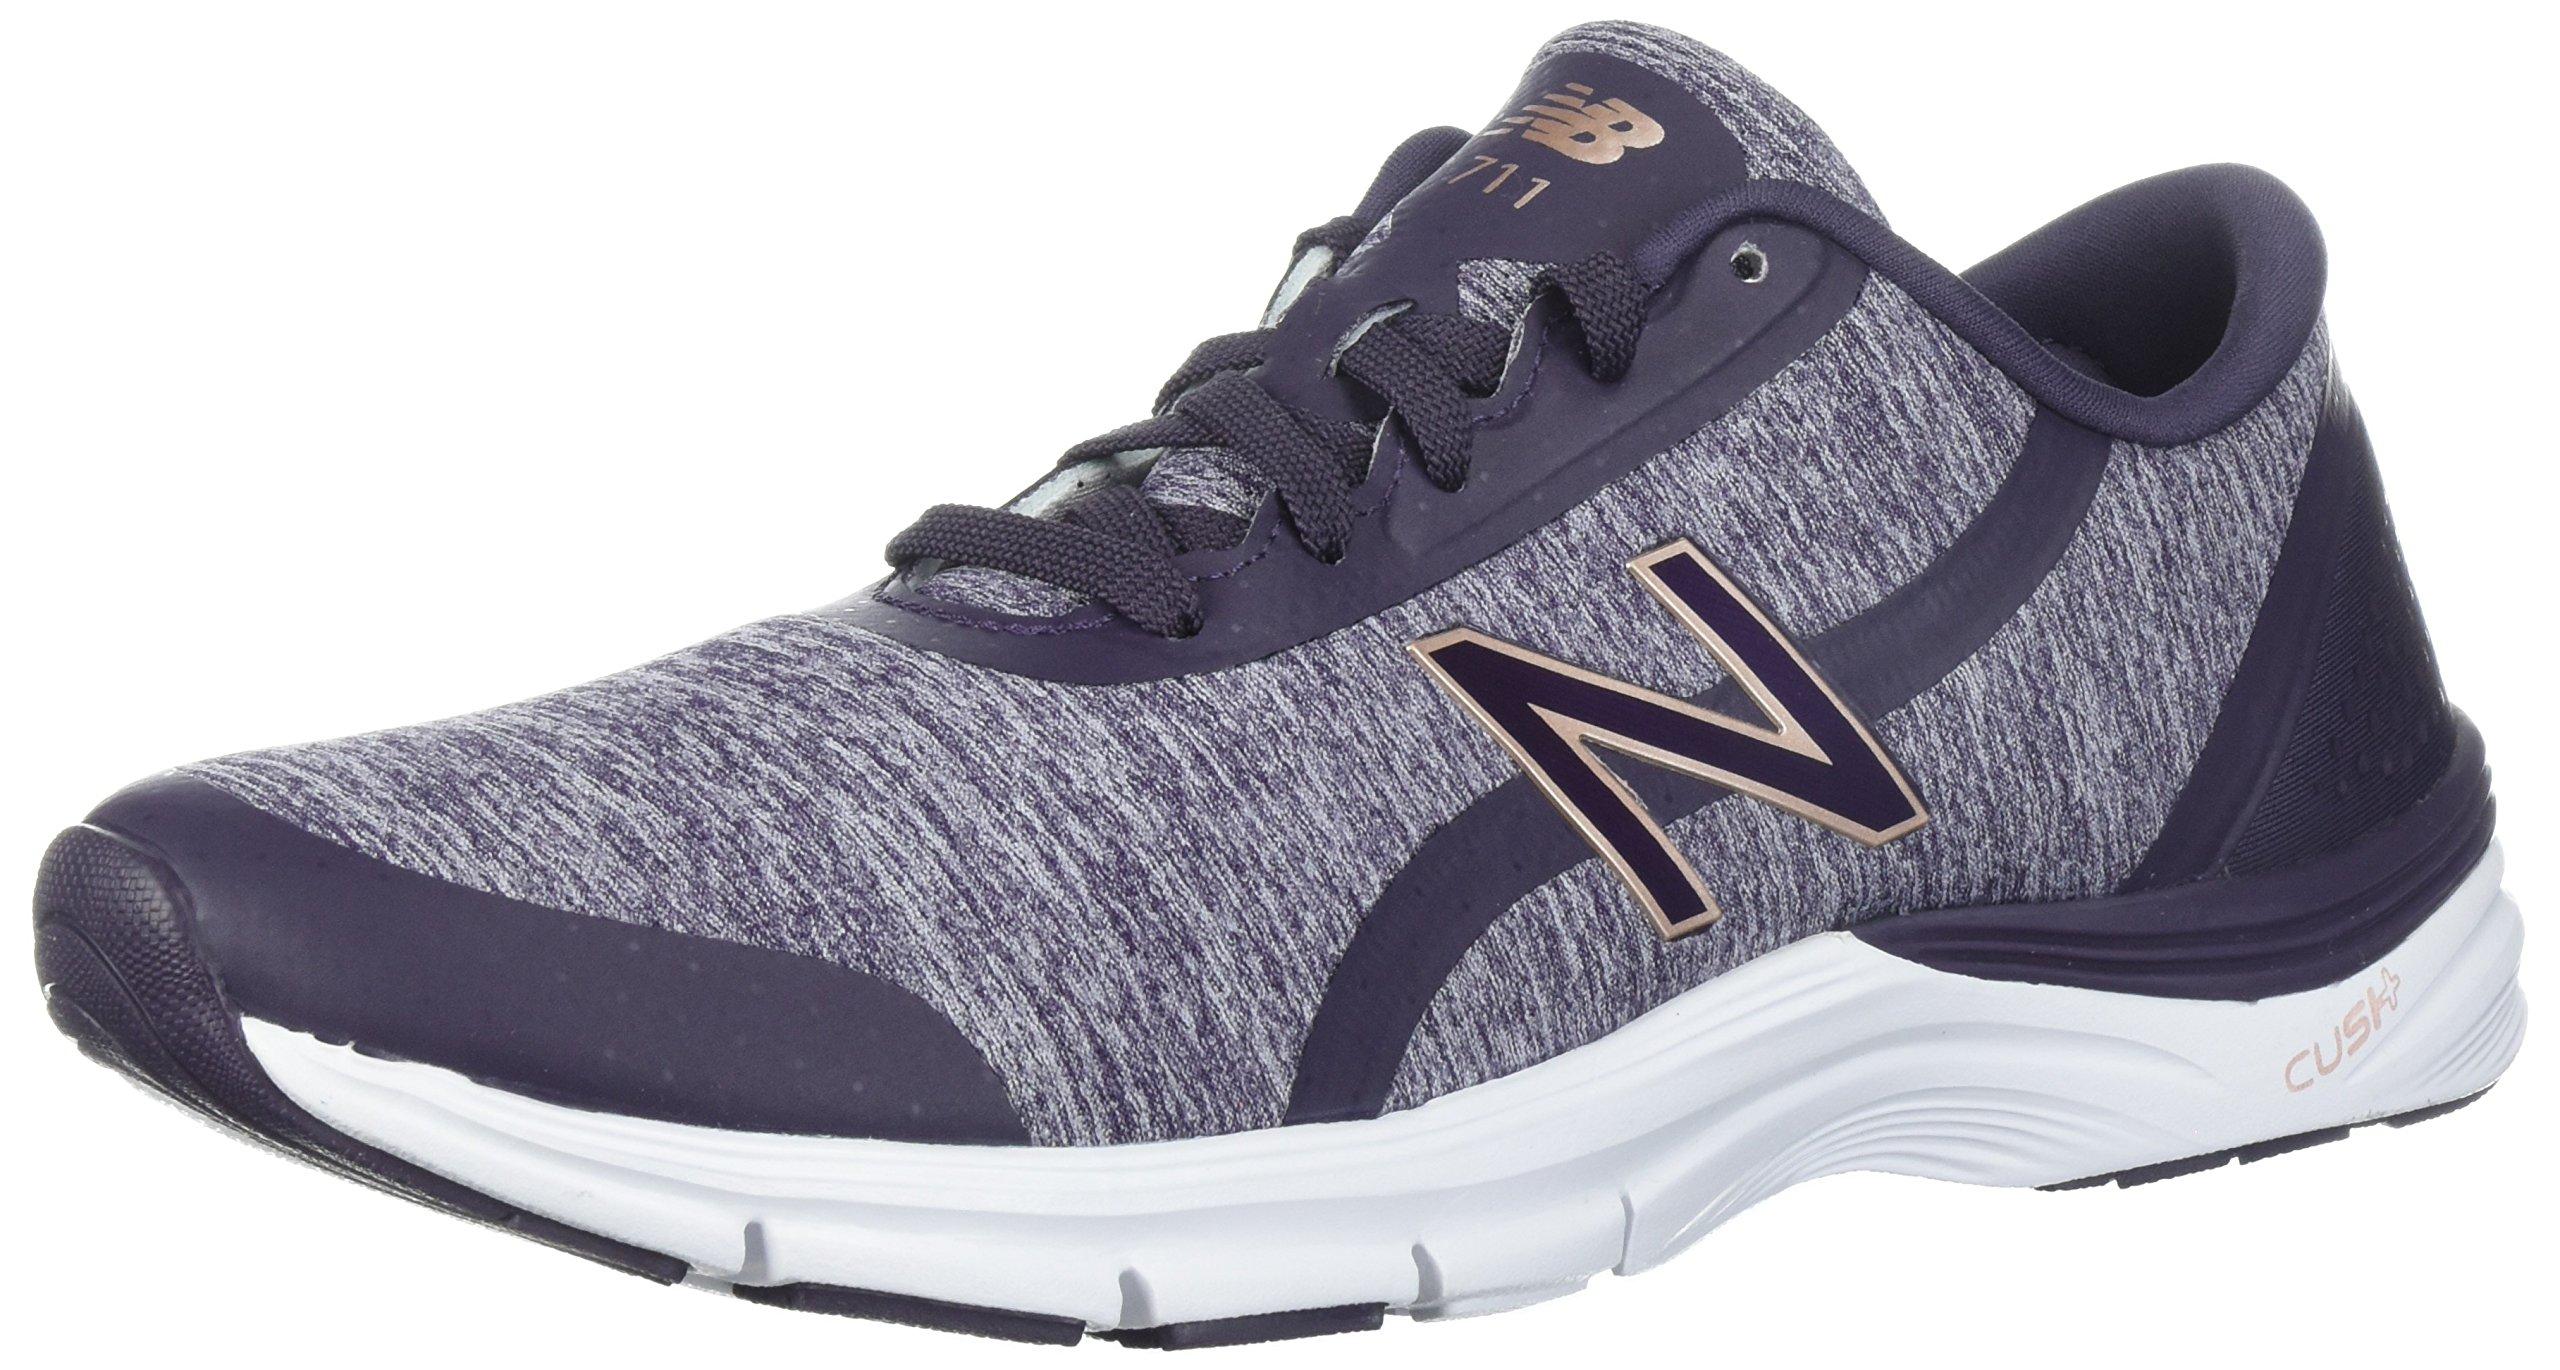 New Balance Women's 711v3 Cush + Cross-Trainer-Shoes, Elderberry/Thistle, 75 B US